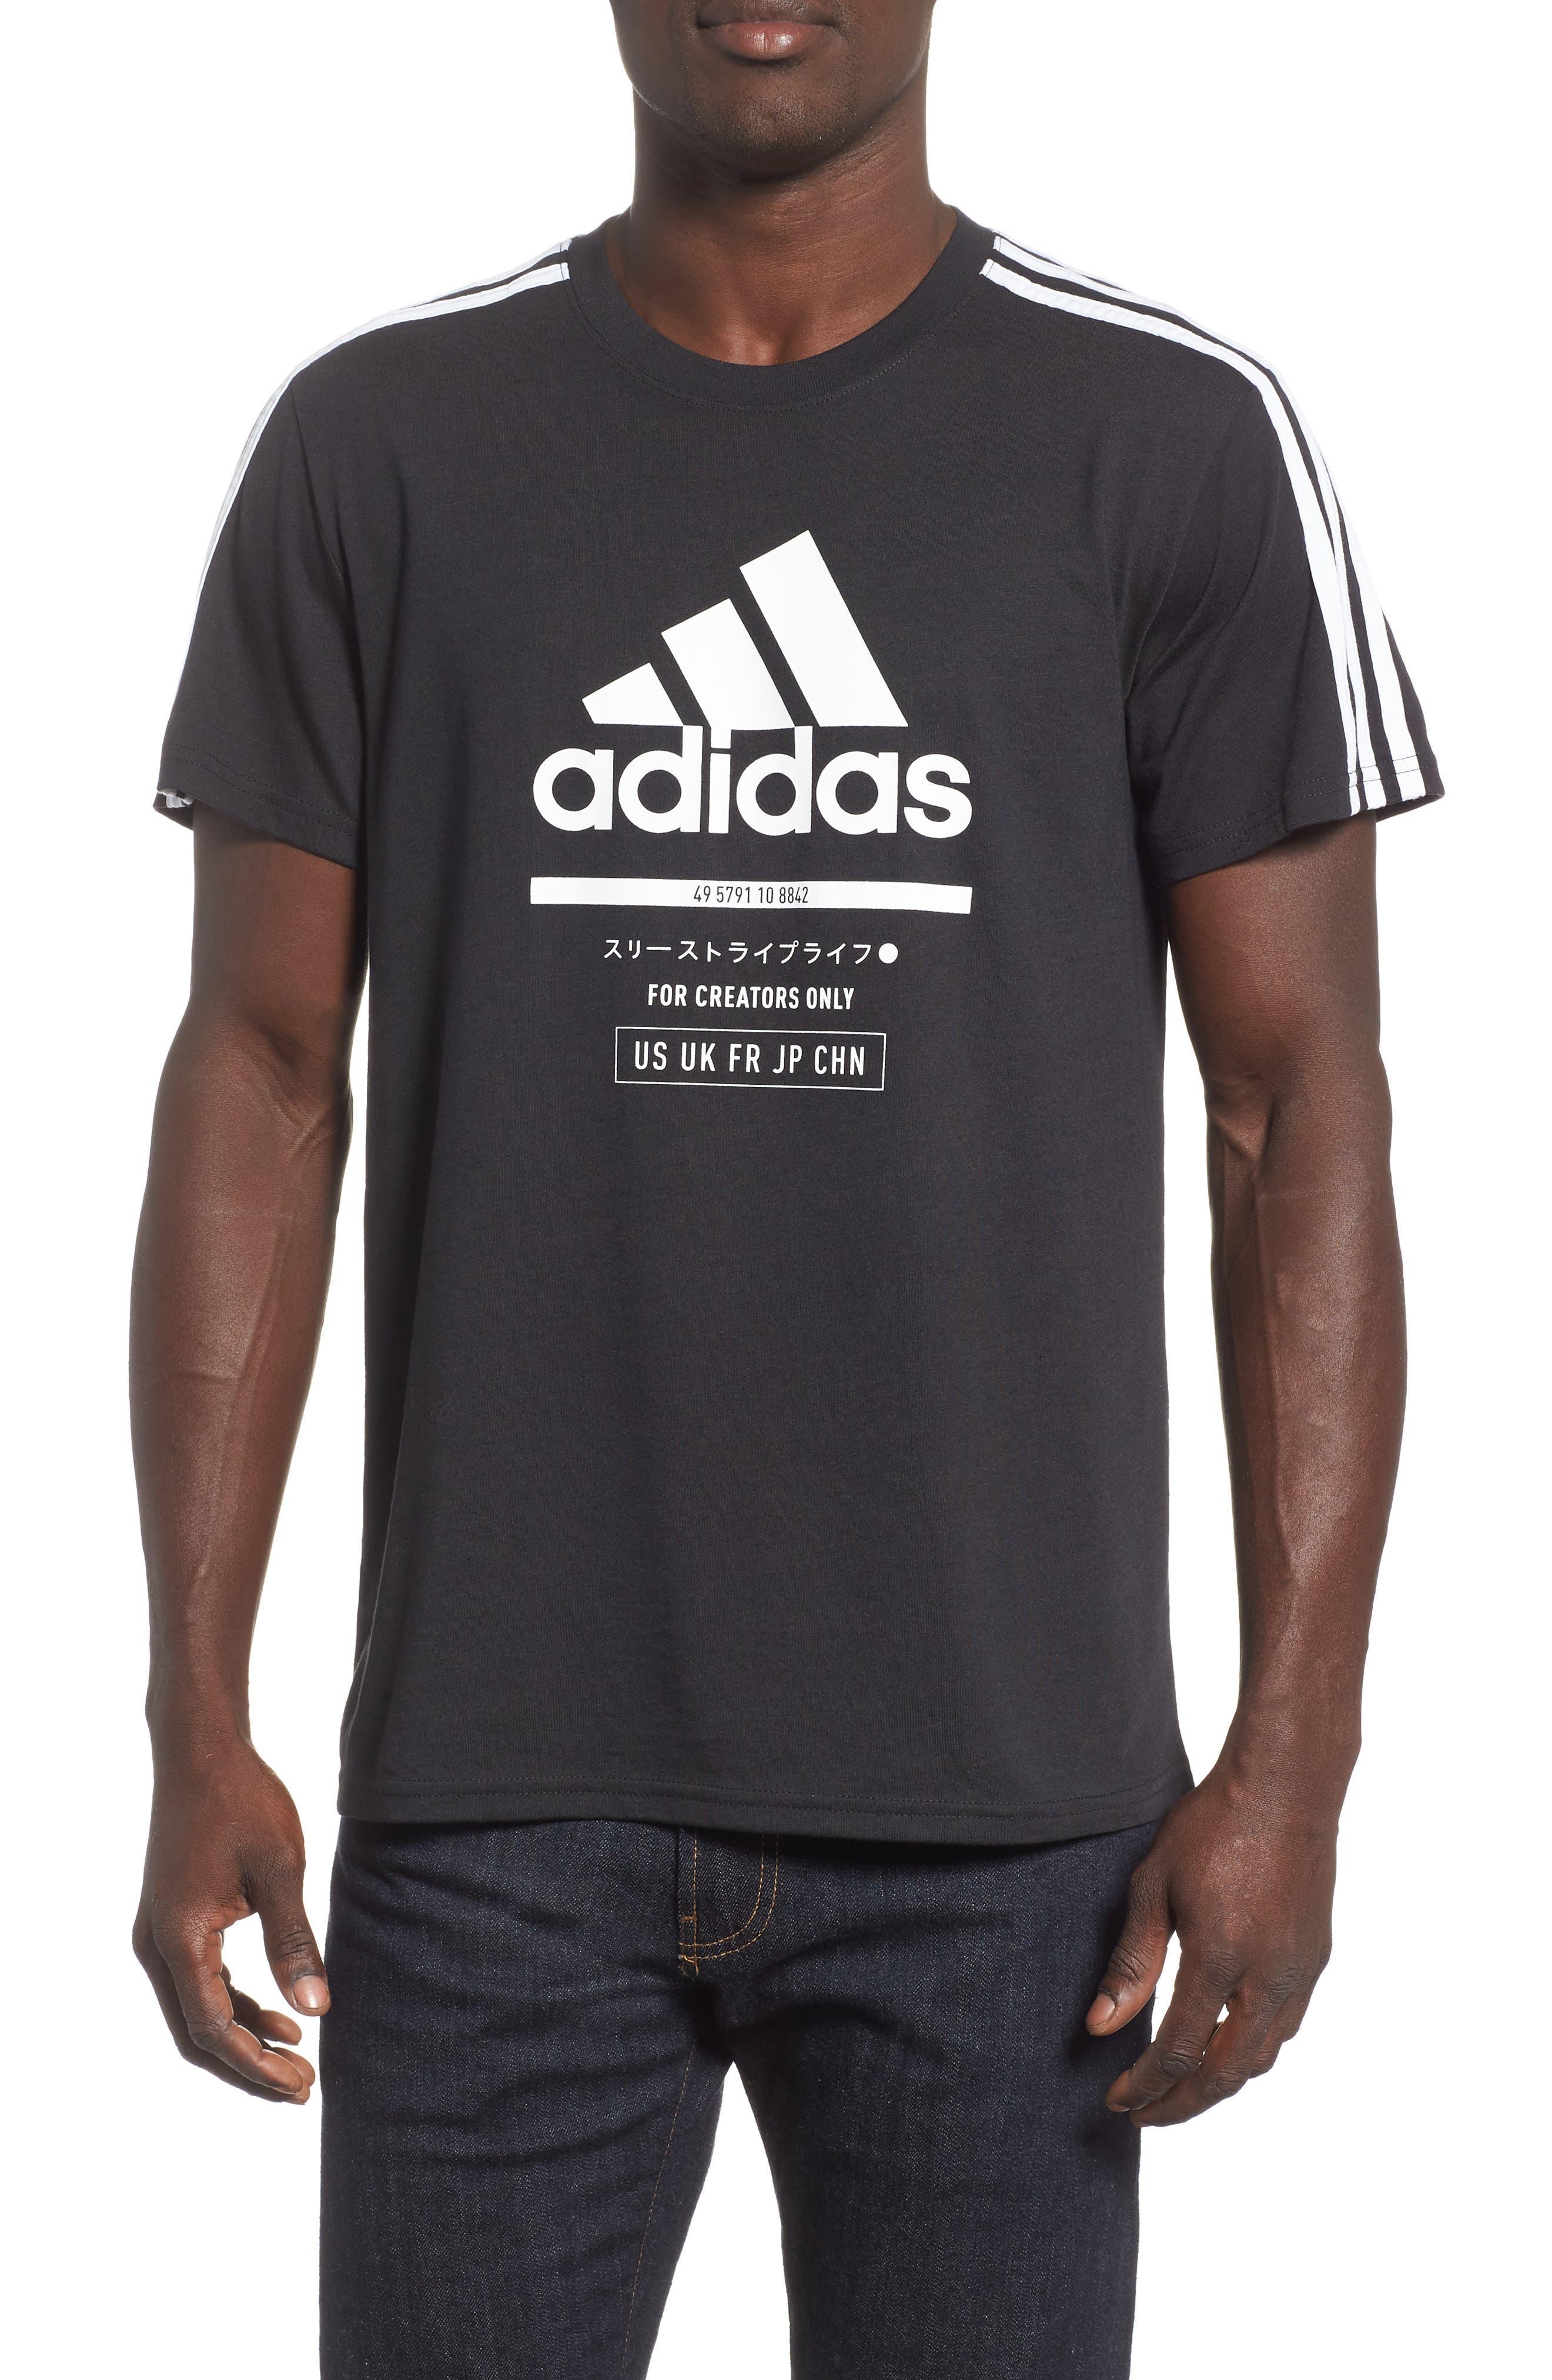 Adidas Classic International T-Shirt, Black